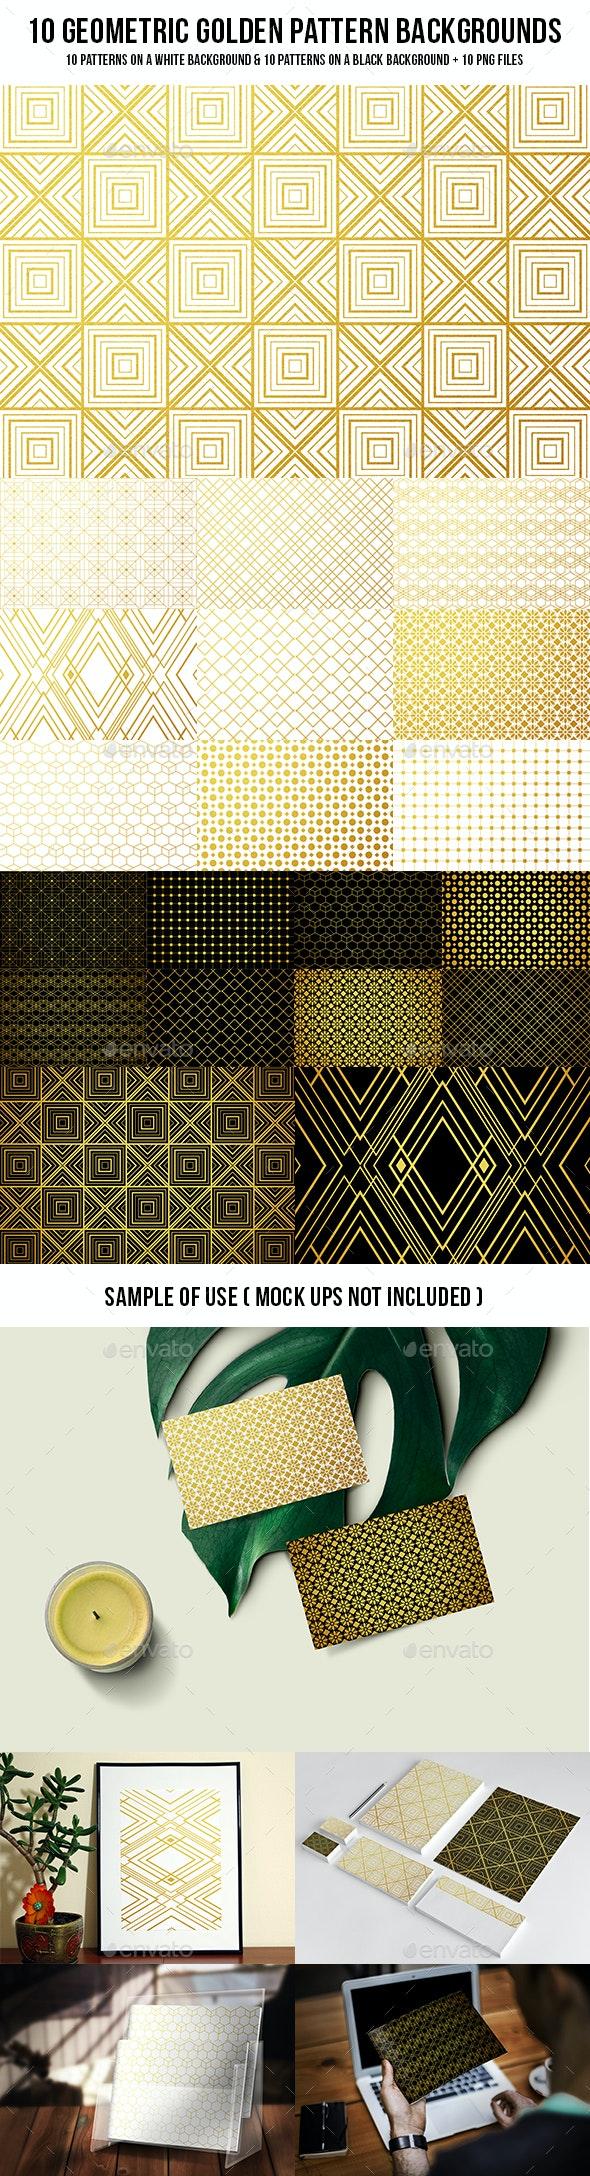 Geometric Golden Pattern Backgrounds - Patterns Backgrounds